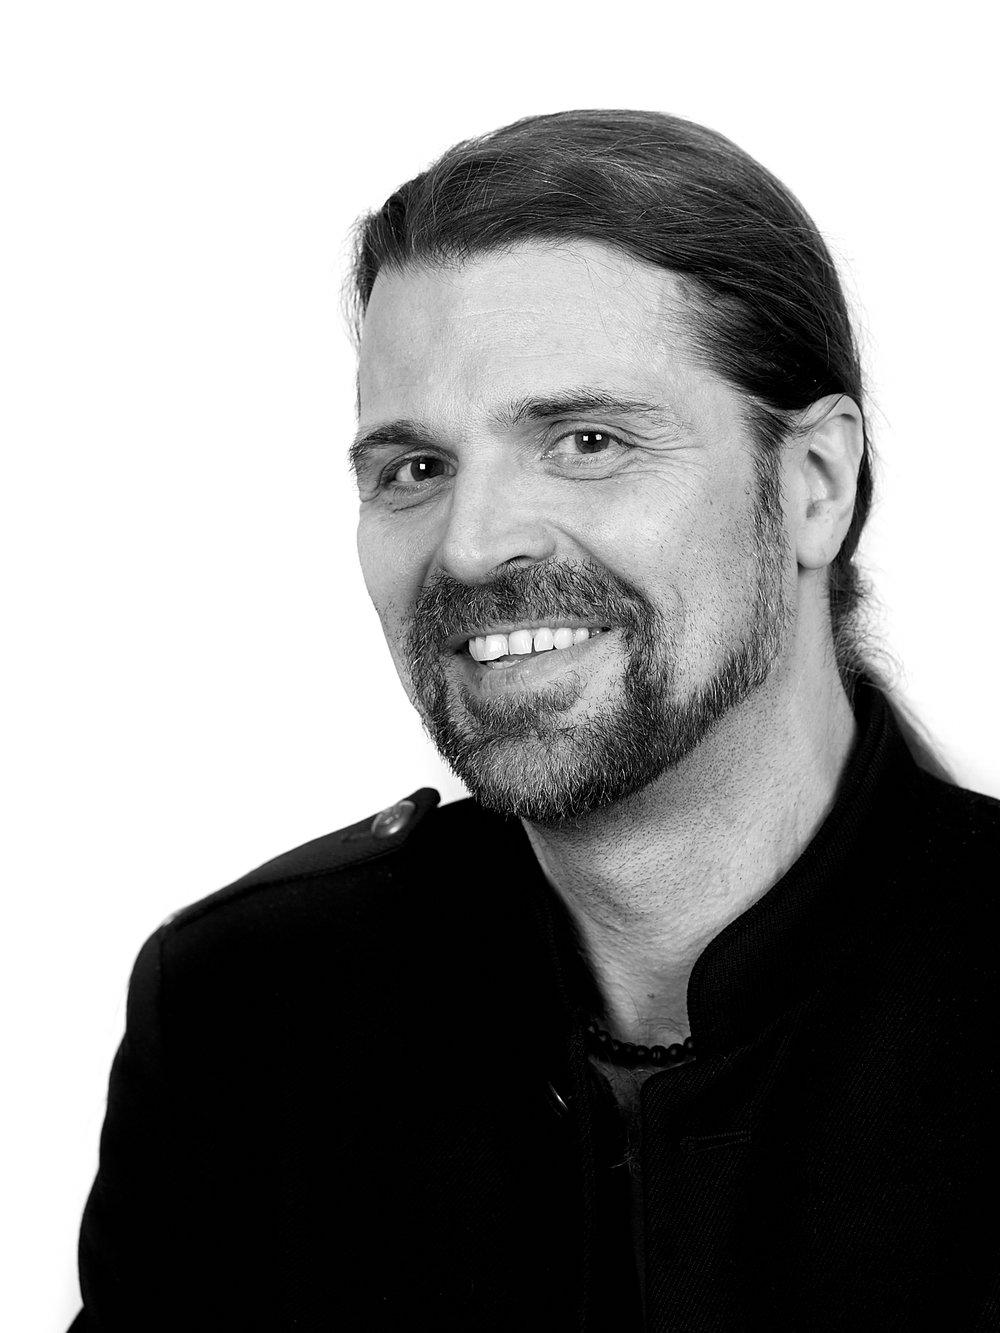 Daniel Vodusek - VD och Art DirectorADV Idé & Designdaniel@adv.se070-840 99 40